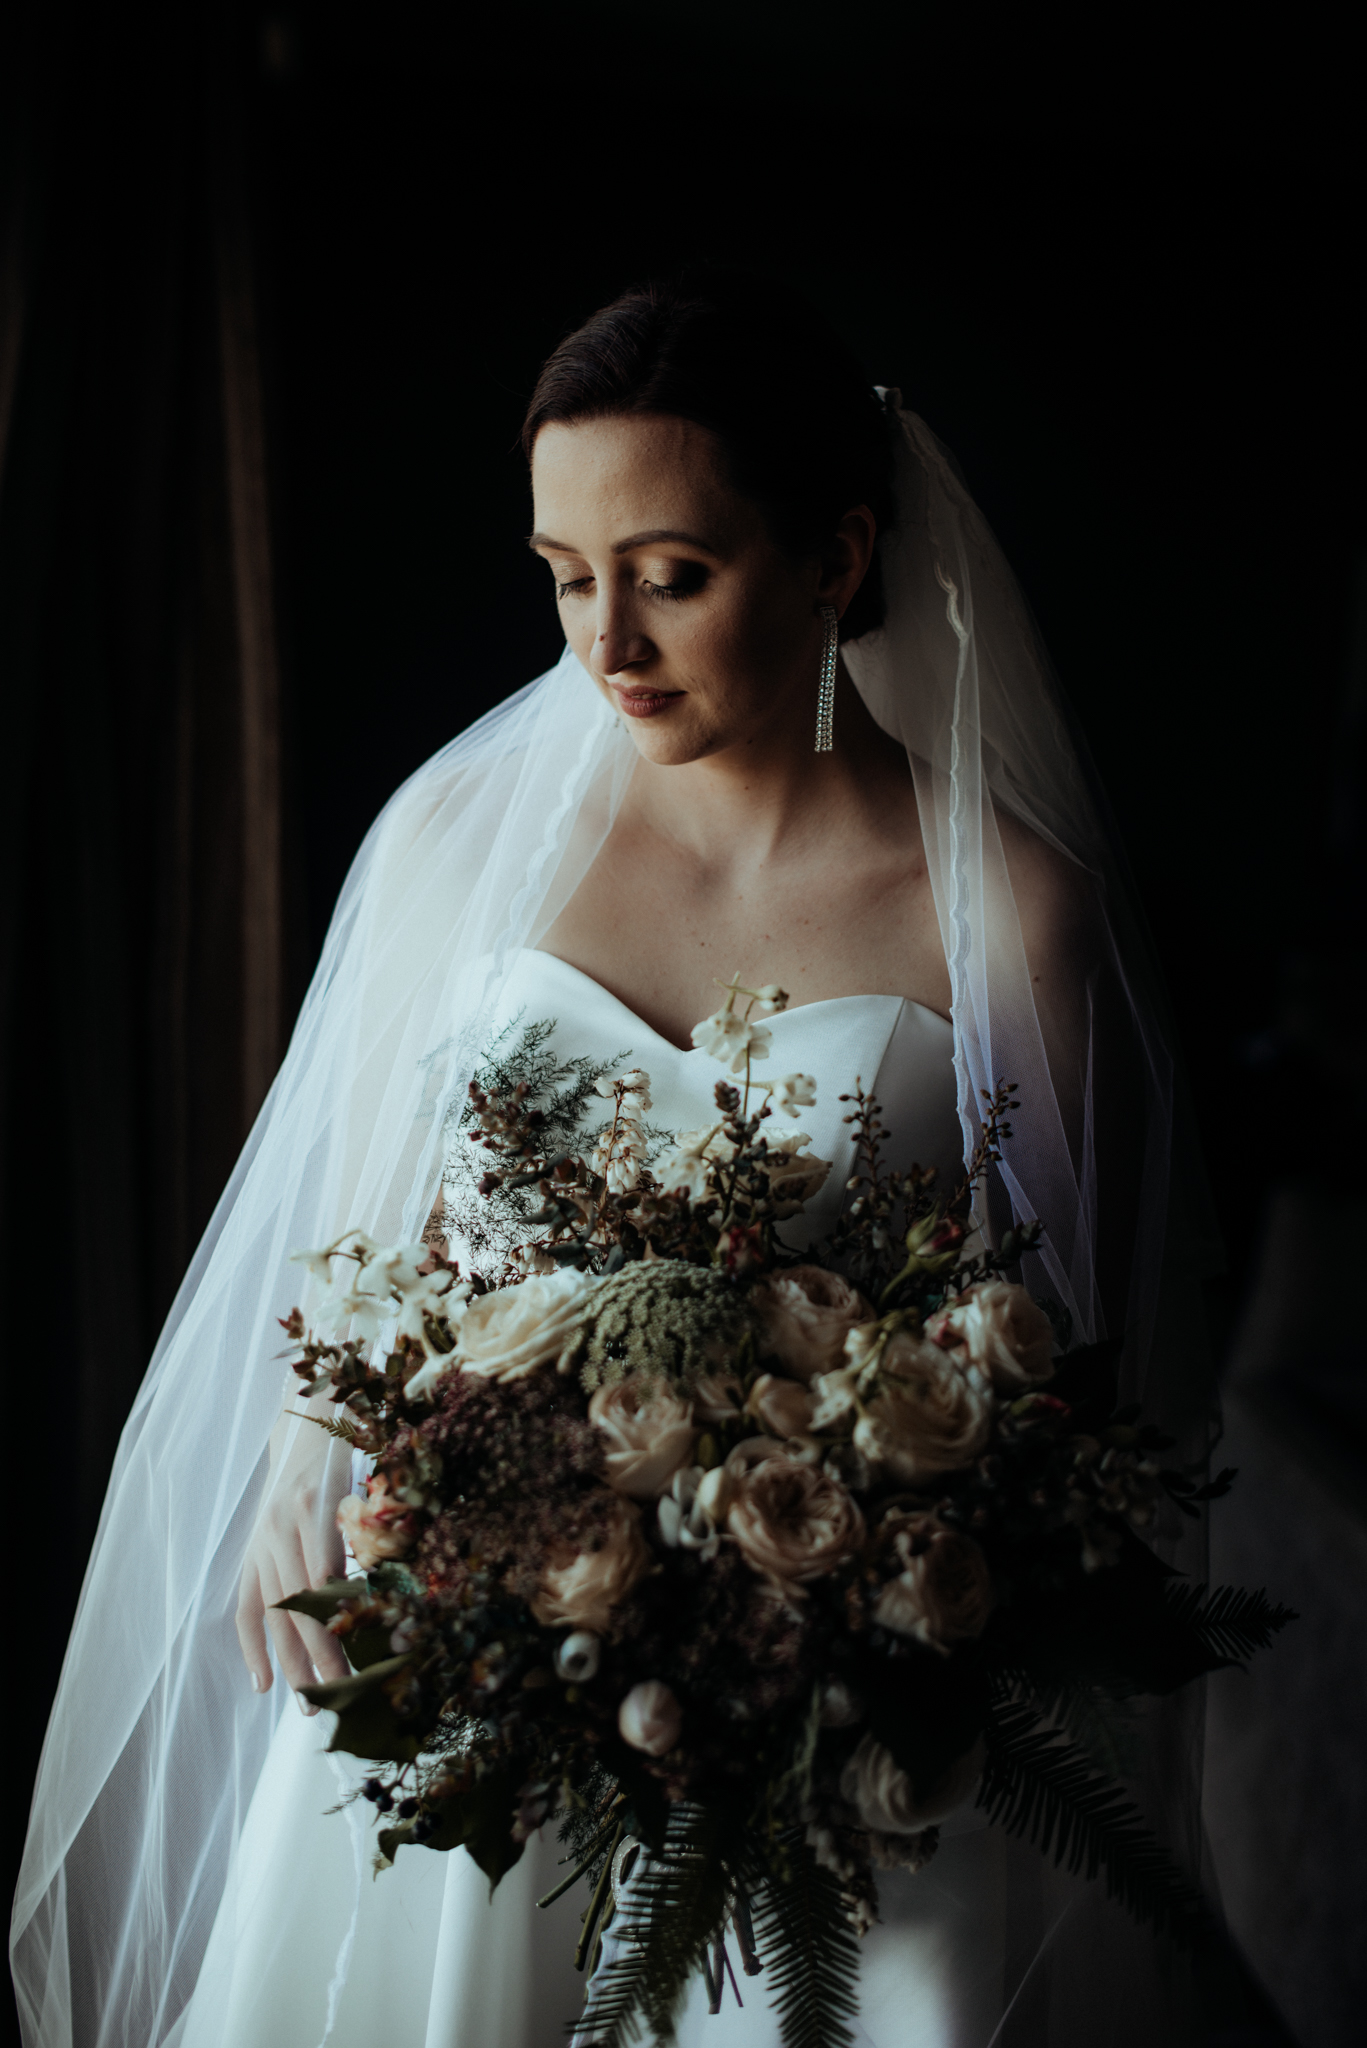 LOVELENSCAPES PHOTOGRAPHY • BRISBANE WEDDING PHOTOGRAPHER • L+M • 114.jpg